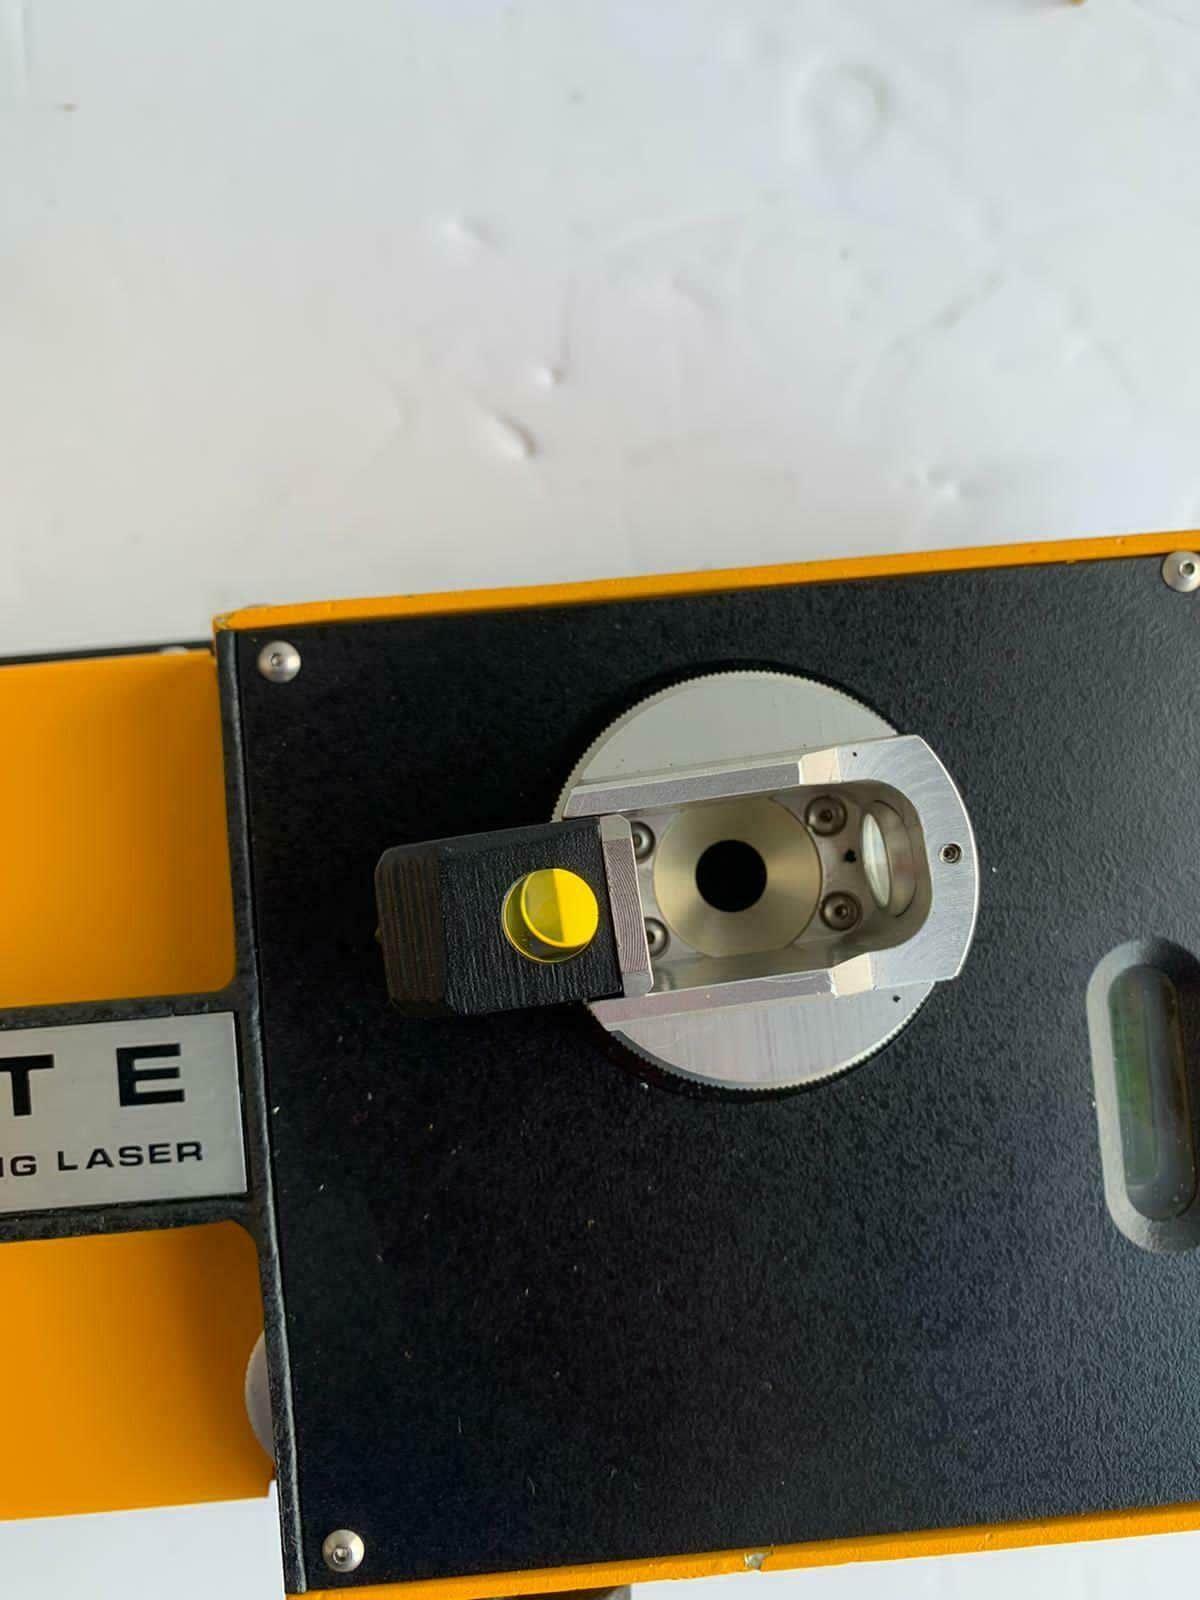 Spectra Physique 842 Building Laser